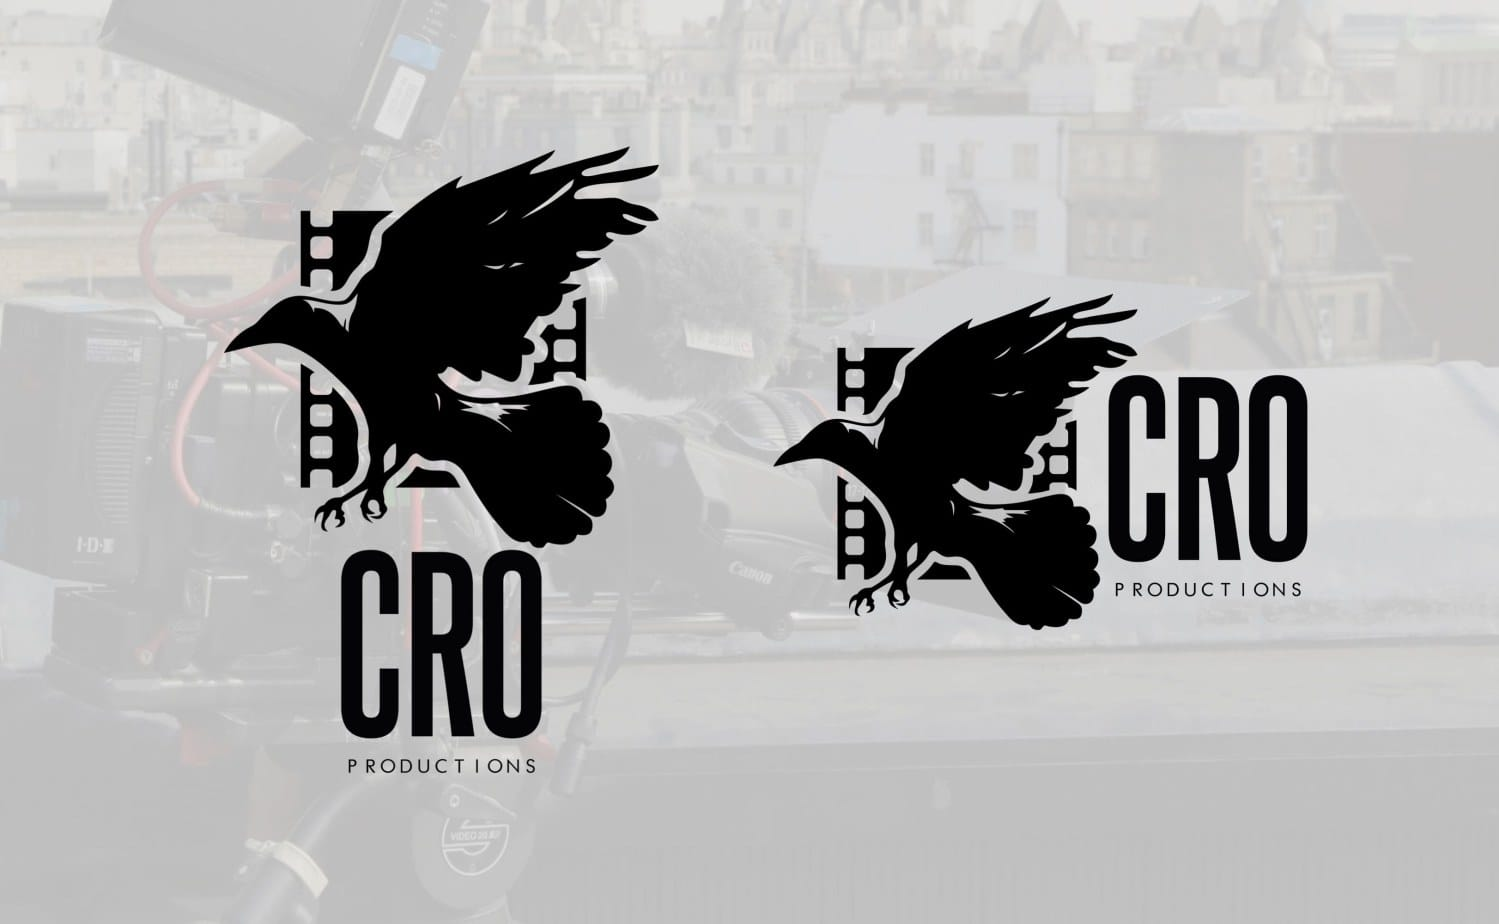 cronew2